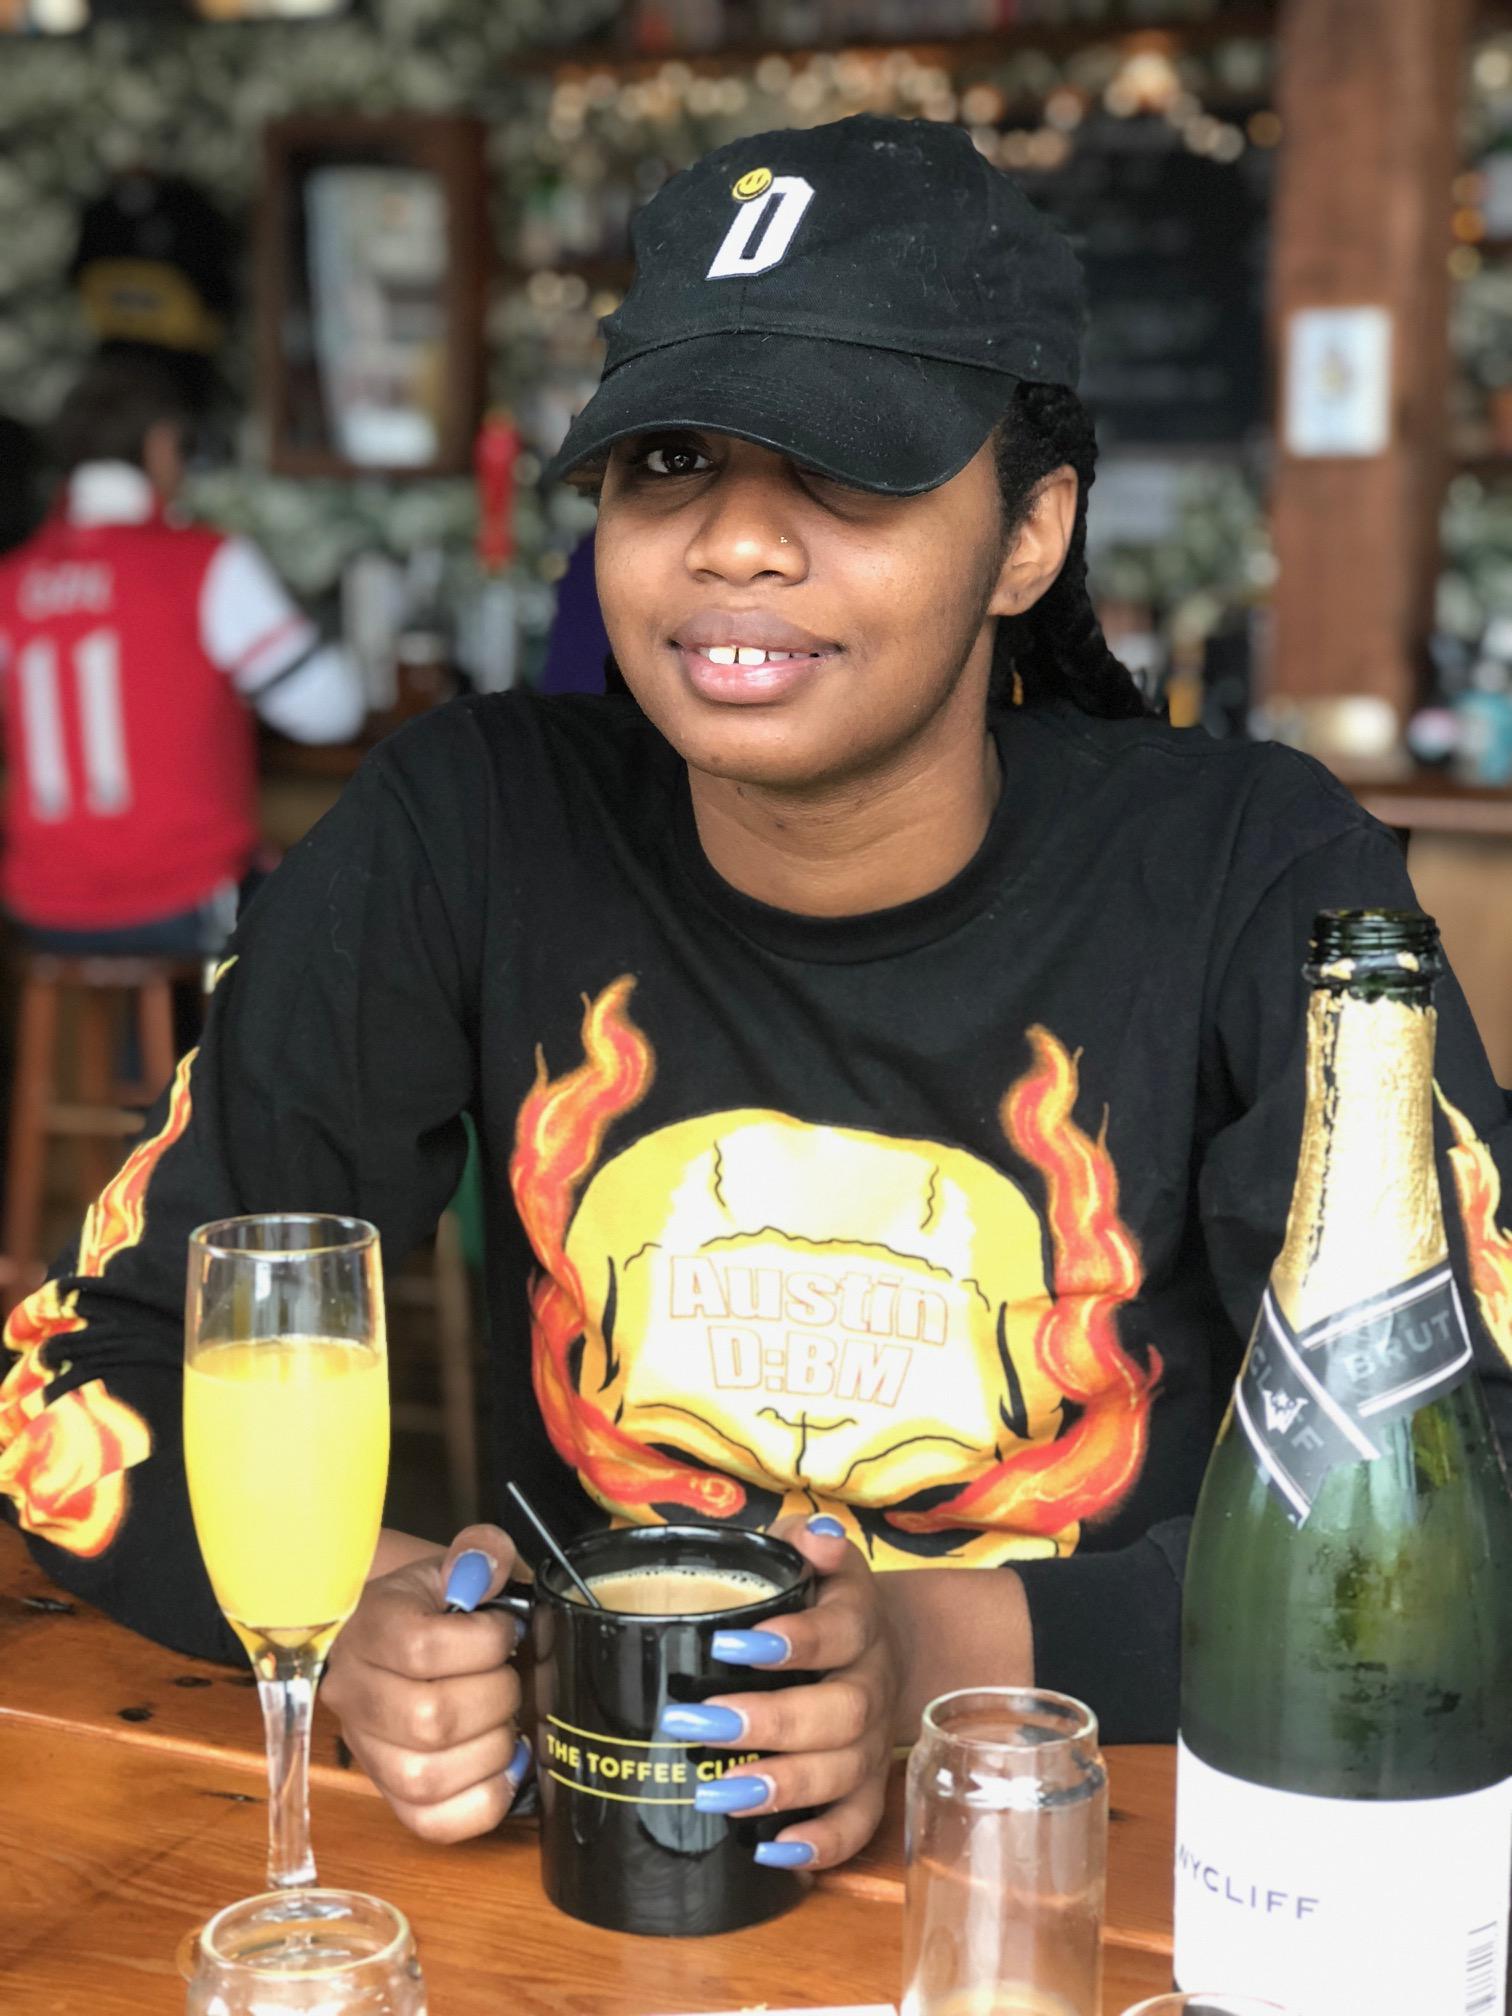 jordan drink coffee 2018 champagne.jpg